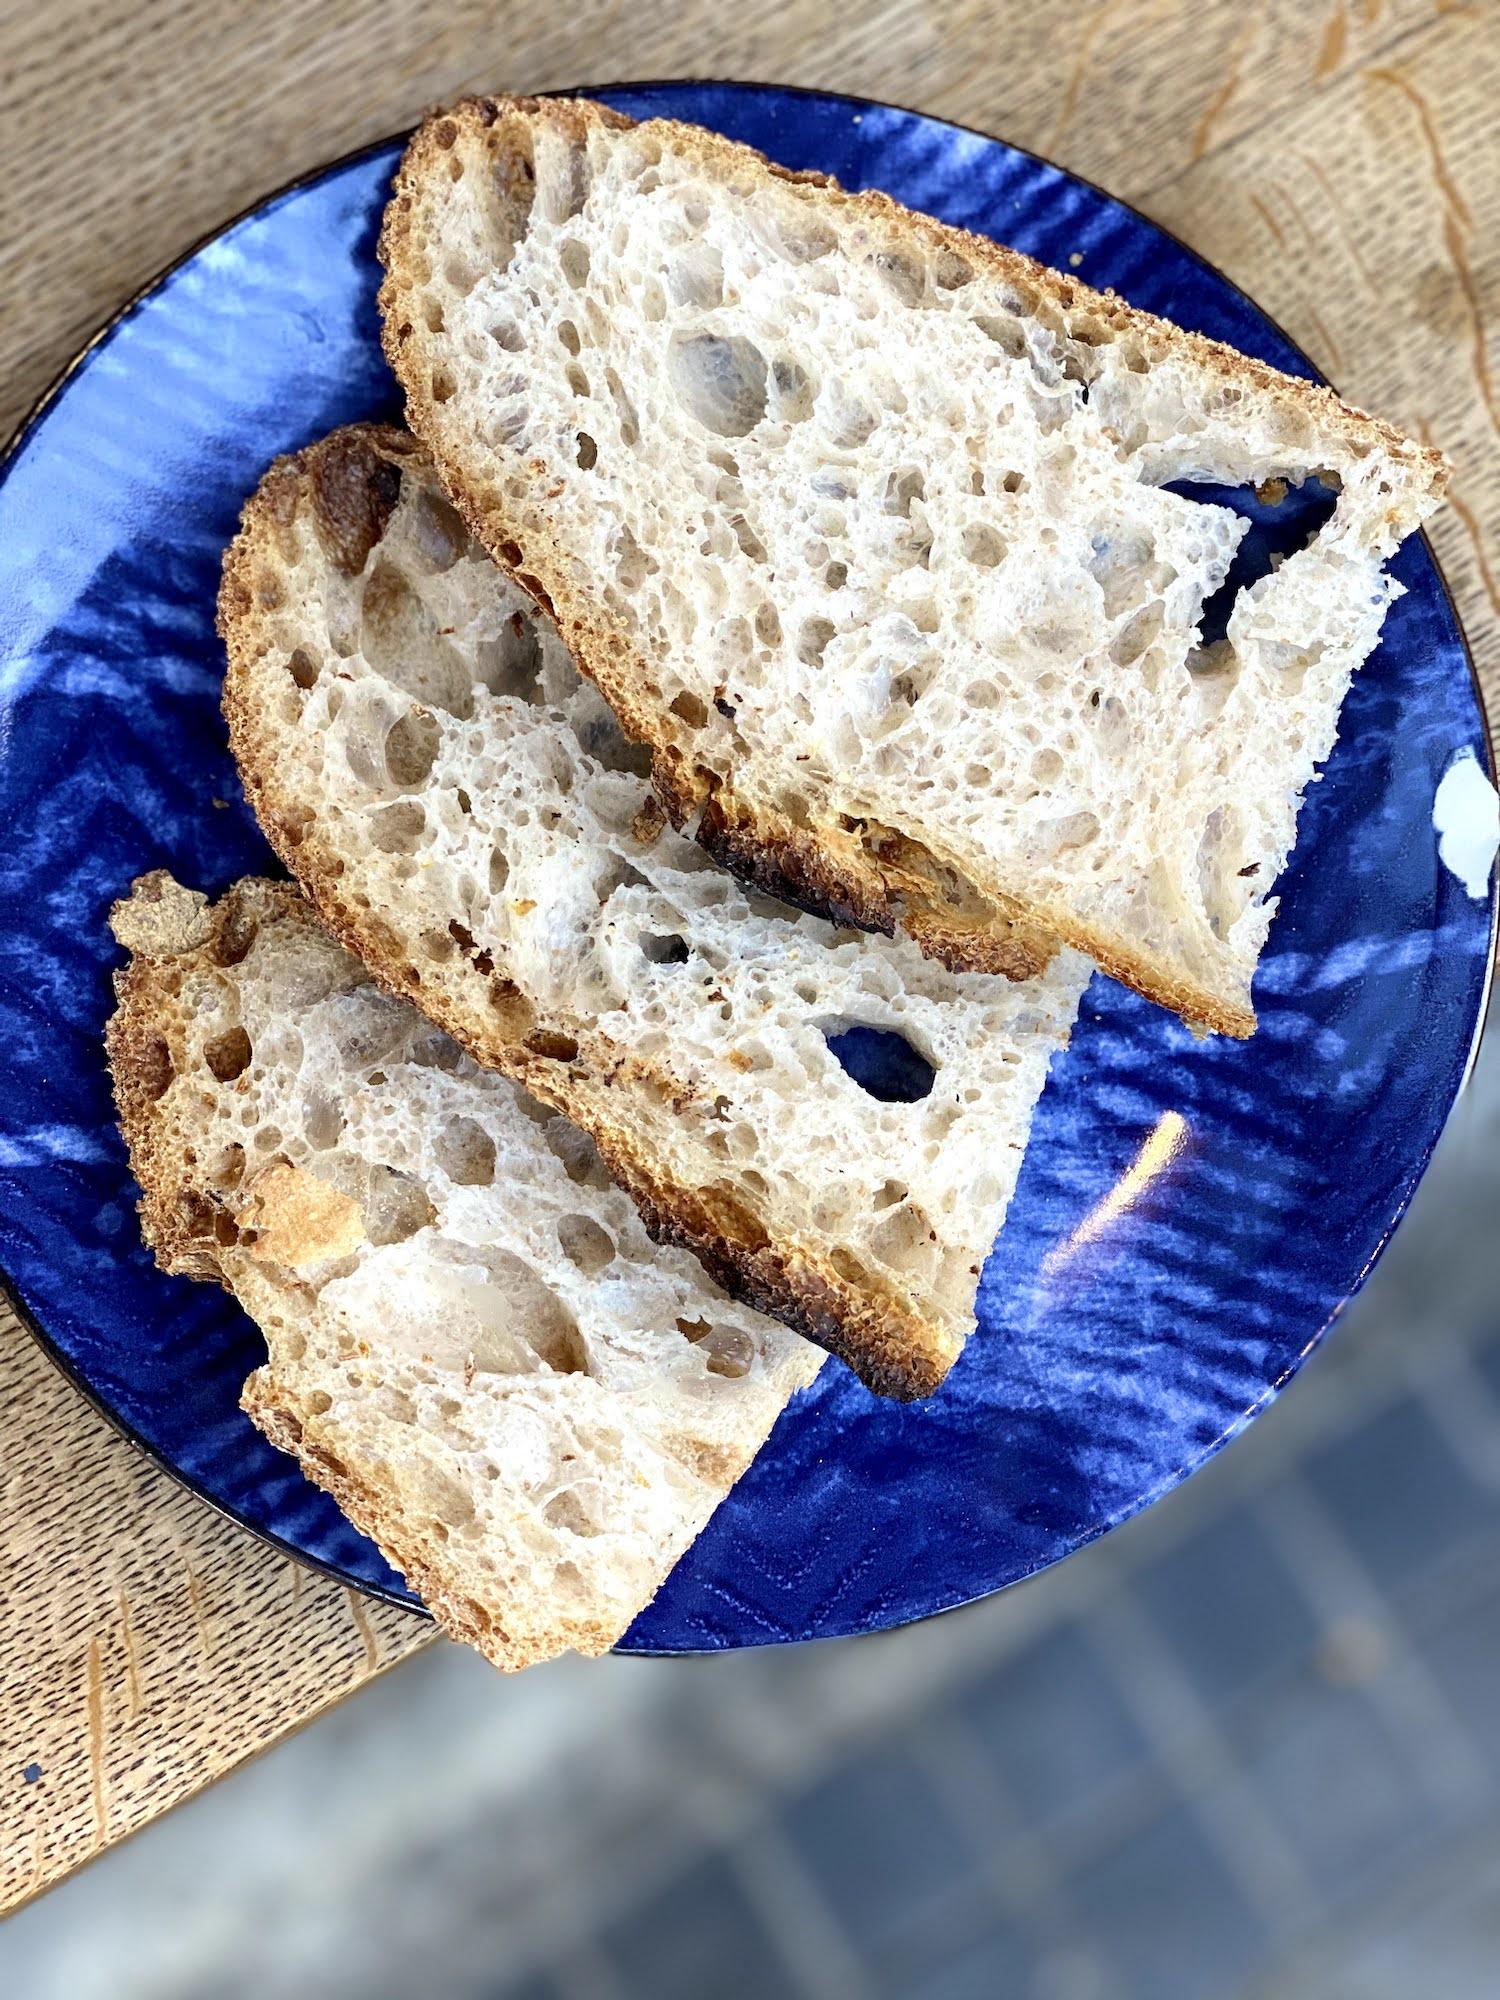 img_4351_kenyer_bread_jokuti_vilagevo.jpg